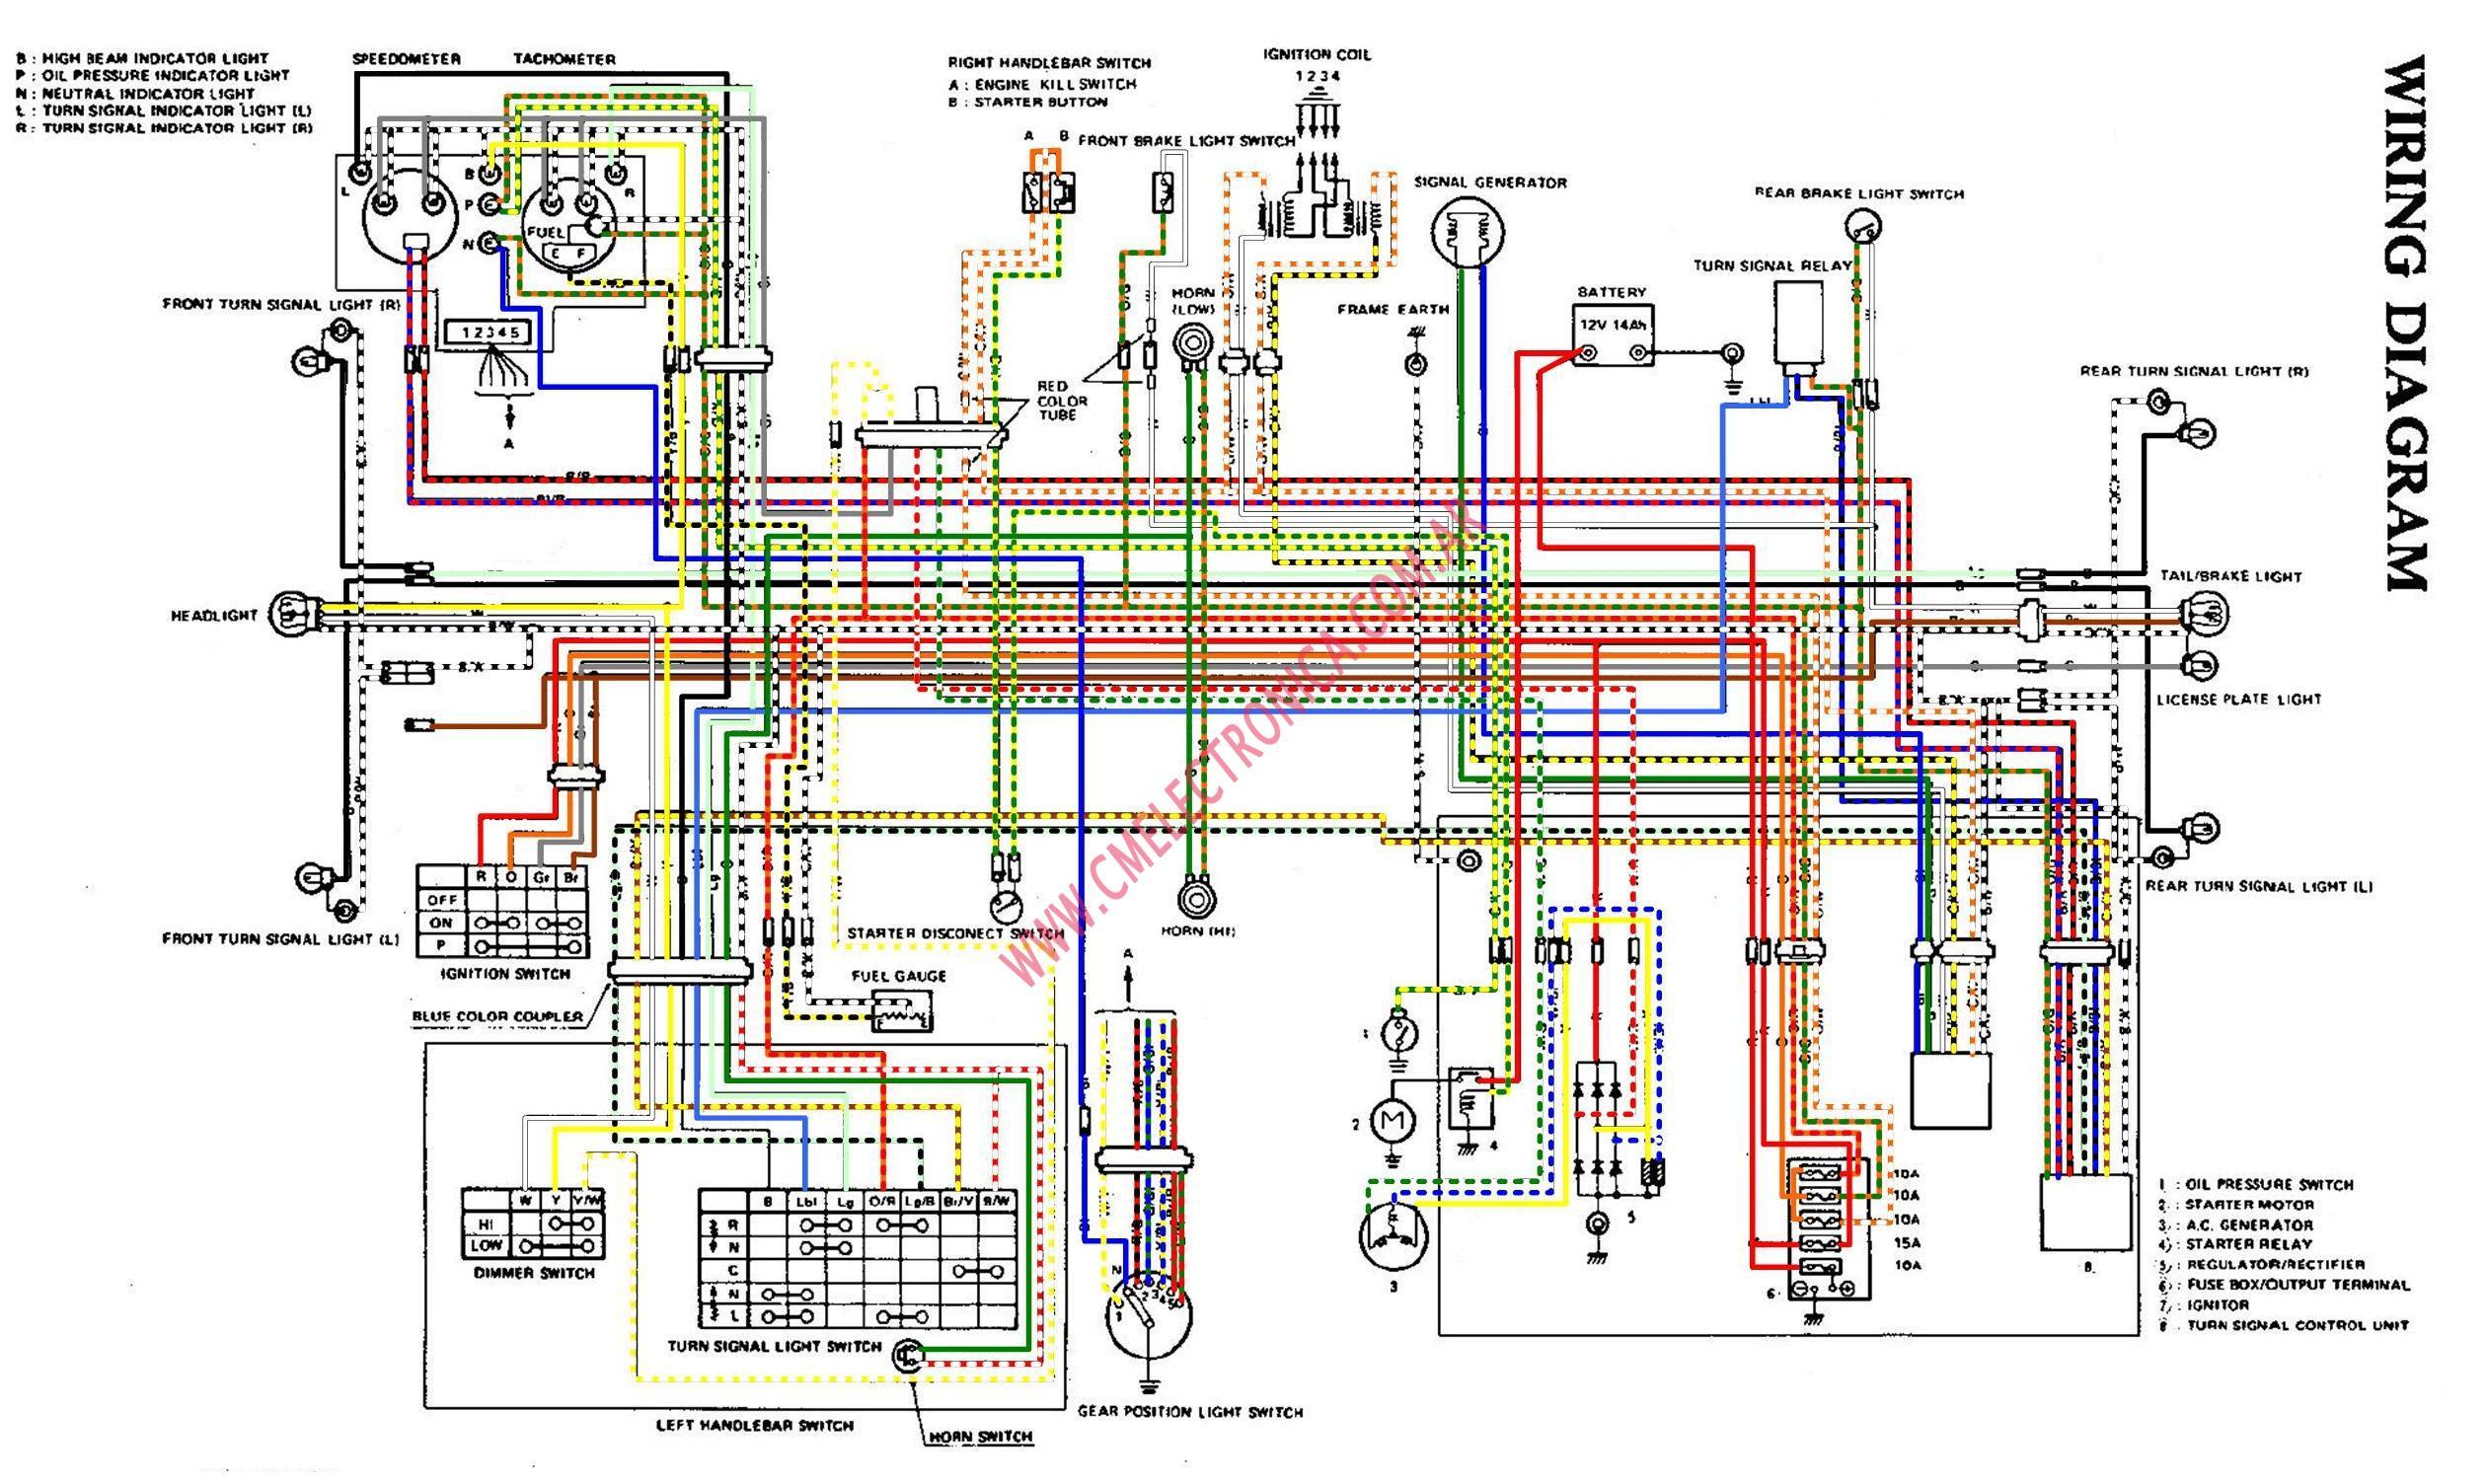 Sv650 K 5 Wiring Diagram Electrical Diagrams Suzuki Symbols 2005 House U2022 2004 Manual